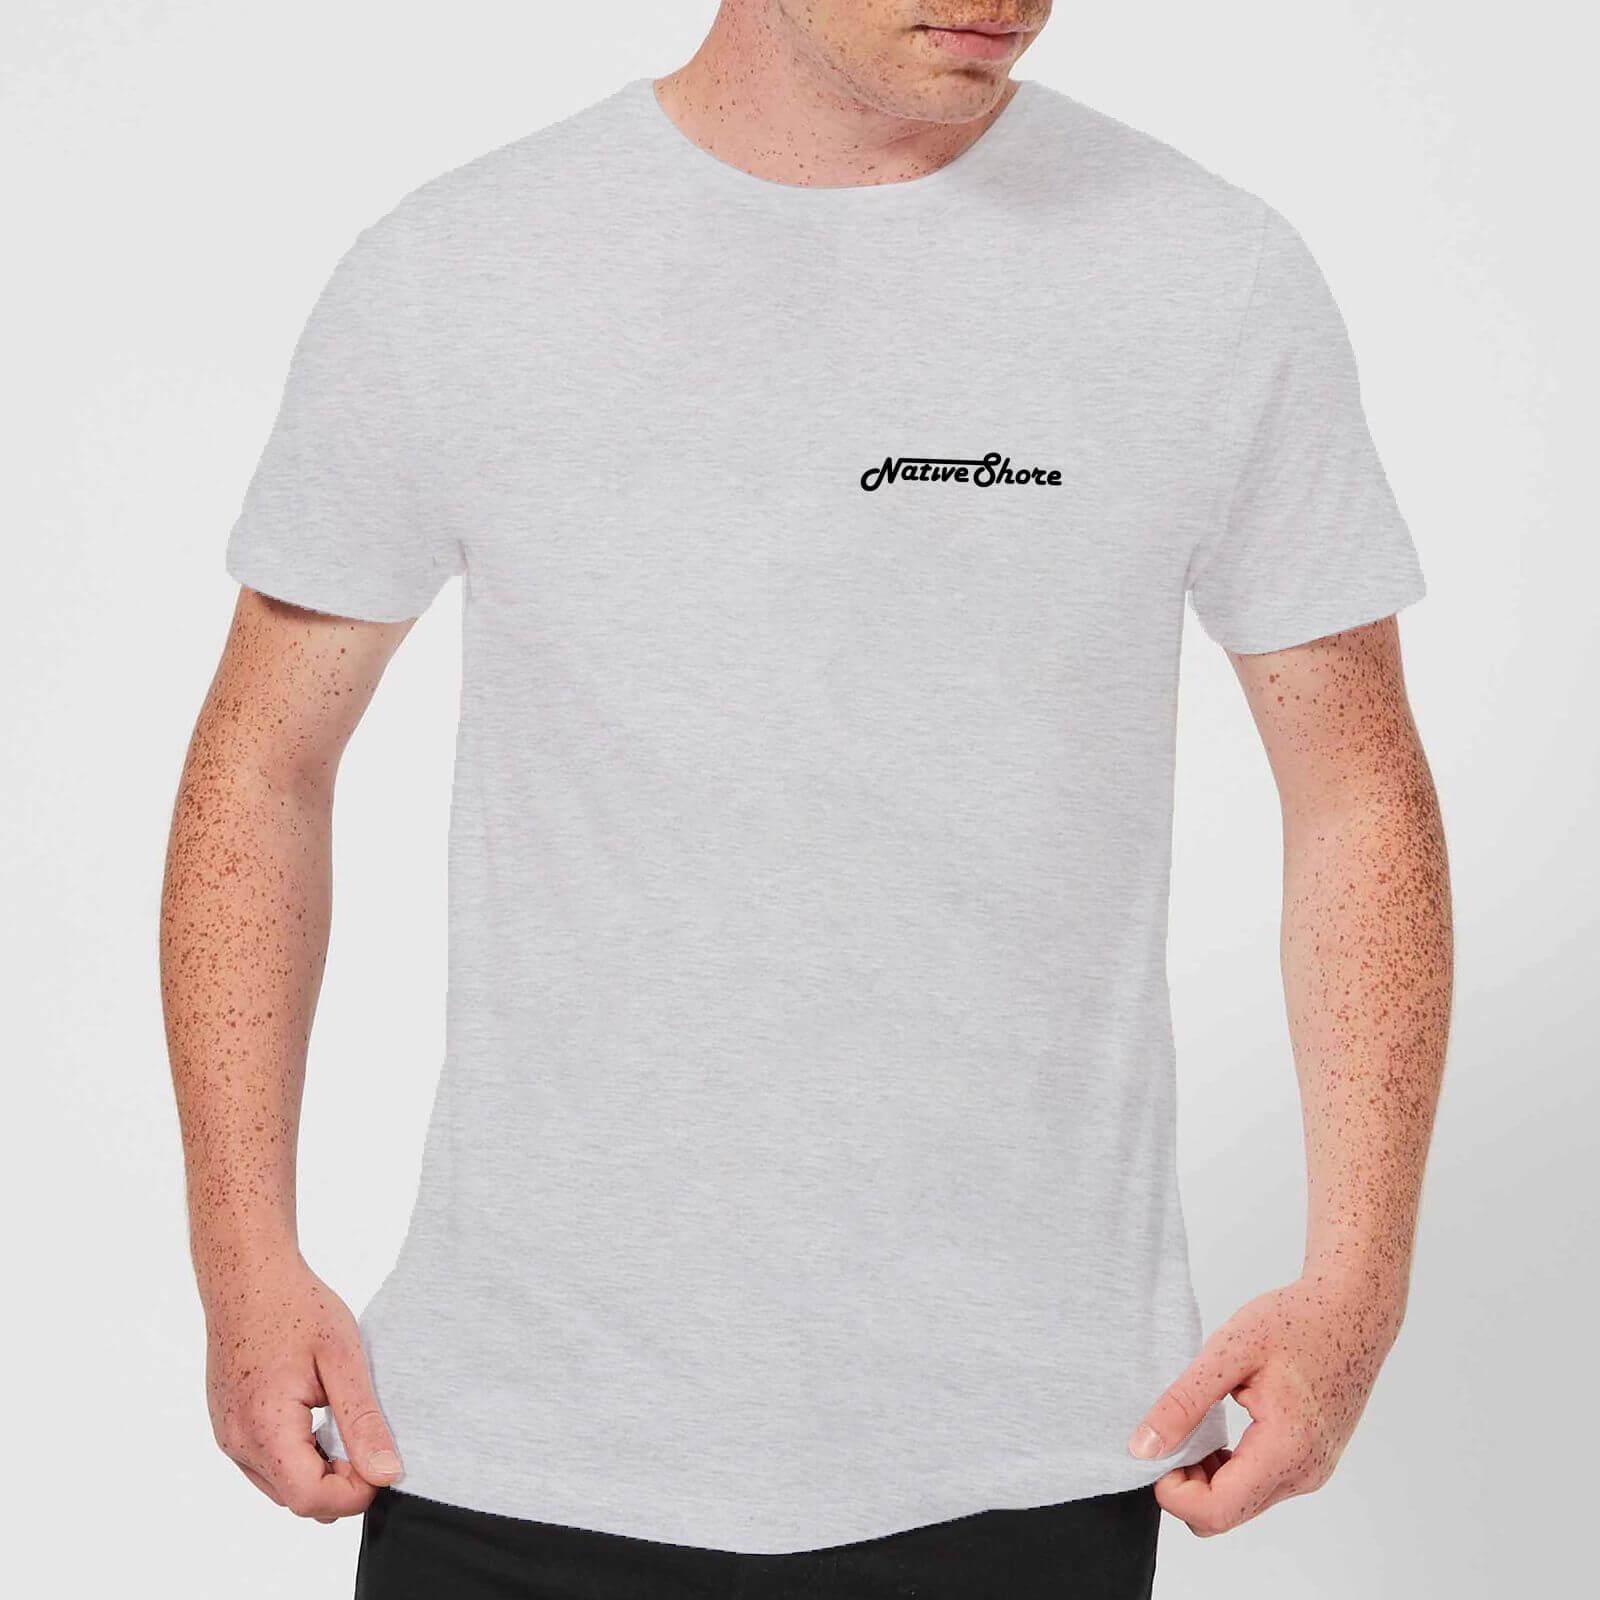 Native Shore Mens Original Shore T Shirt Grey Clothing Zavvi Us